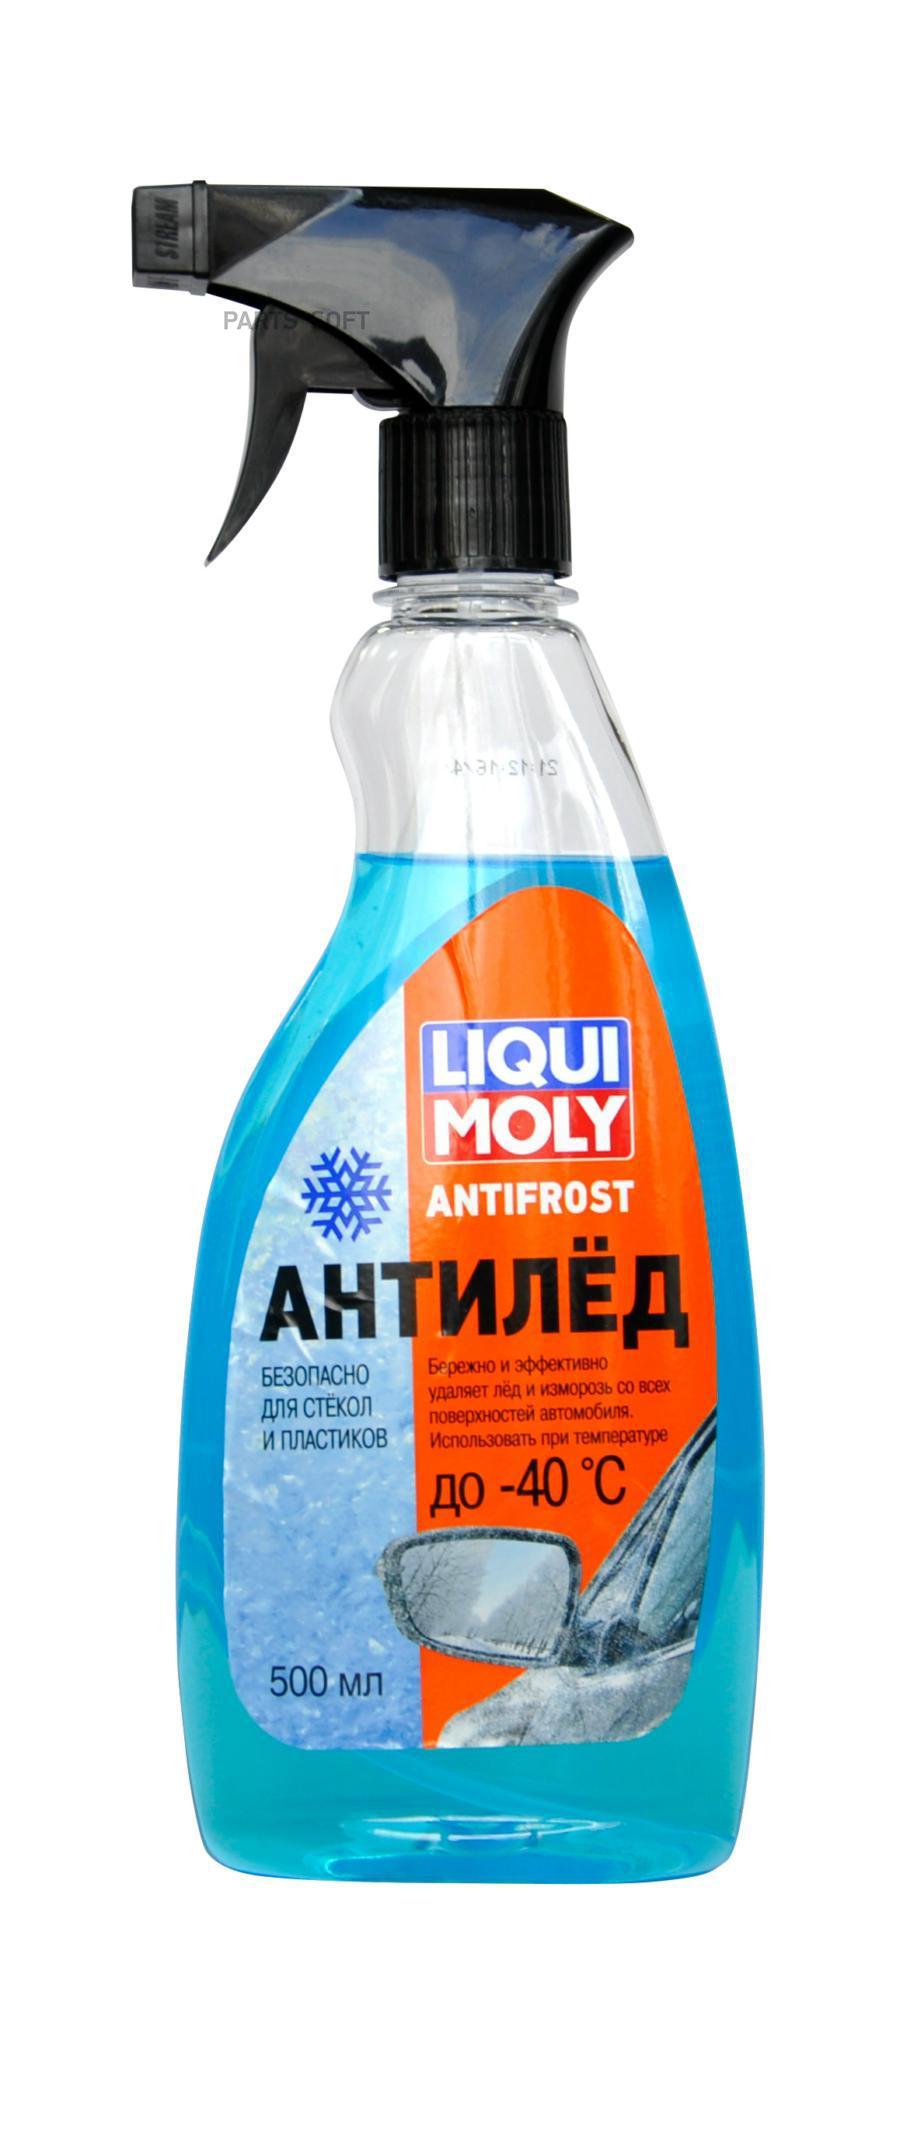 Средство для размораживания стекол ANTIFROST Scheiben-Enteiser - 0.5 л